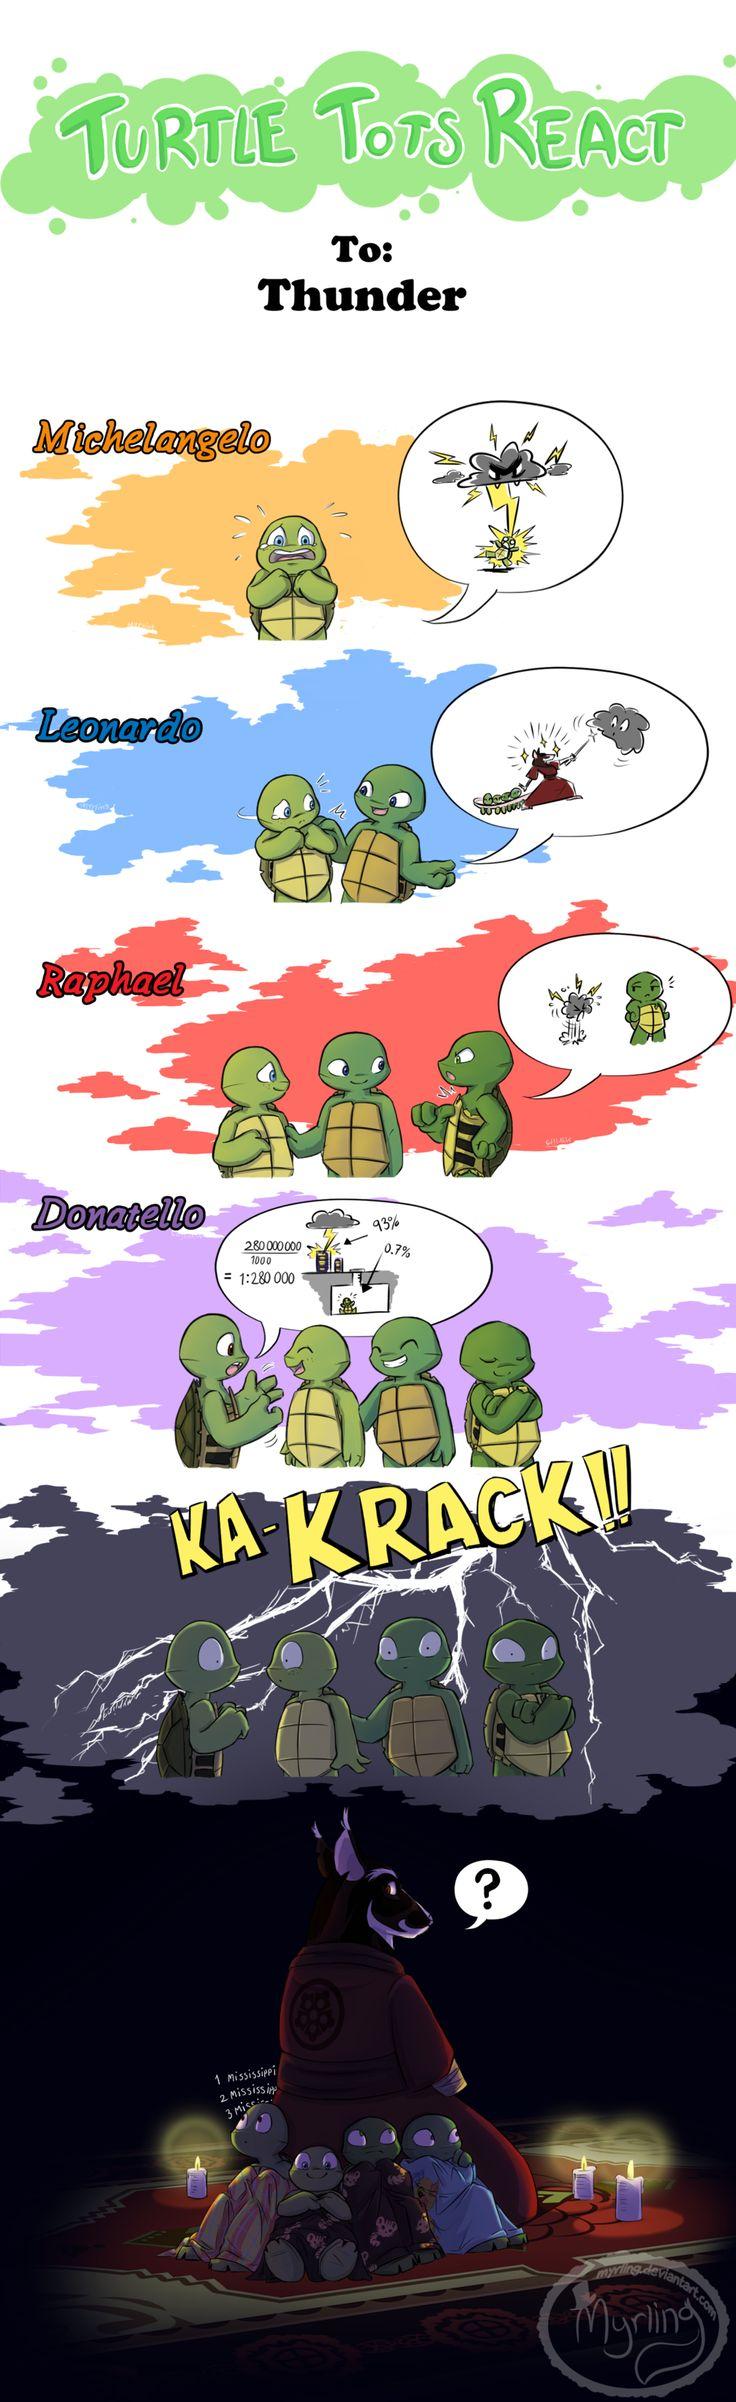 Turtle Tots React - Thunder by Myrling.deviantart.com on @DeviantArt